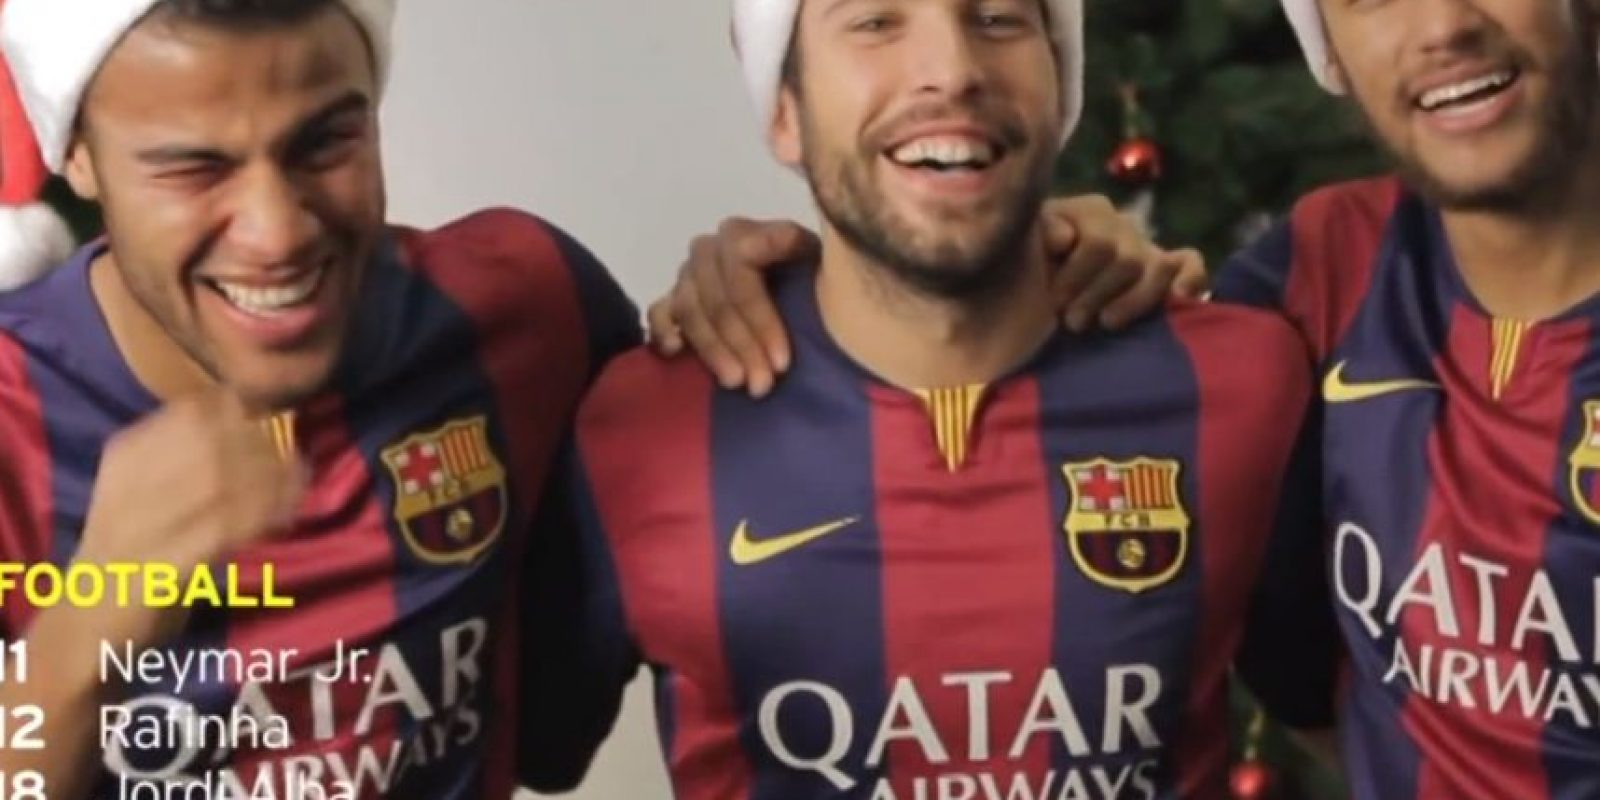 Rafinha, Jordi Alba y Neymar se divirtieron en un spot navideño Foto:Youtube: Barcelona FC